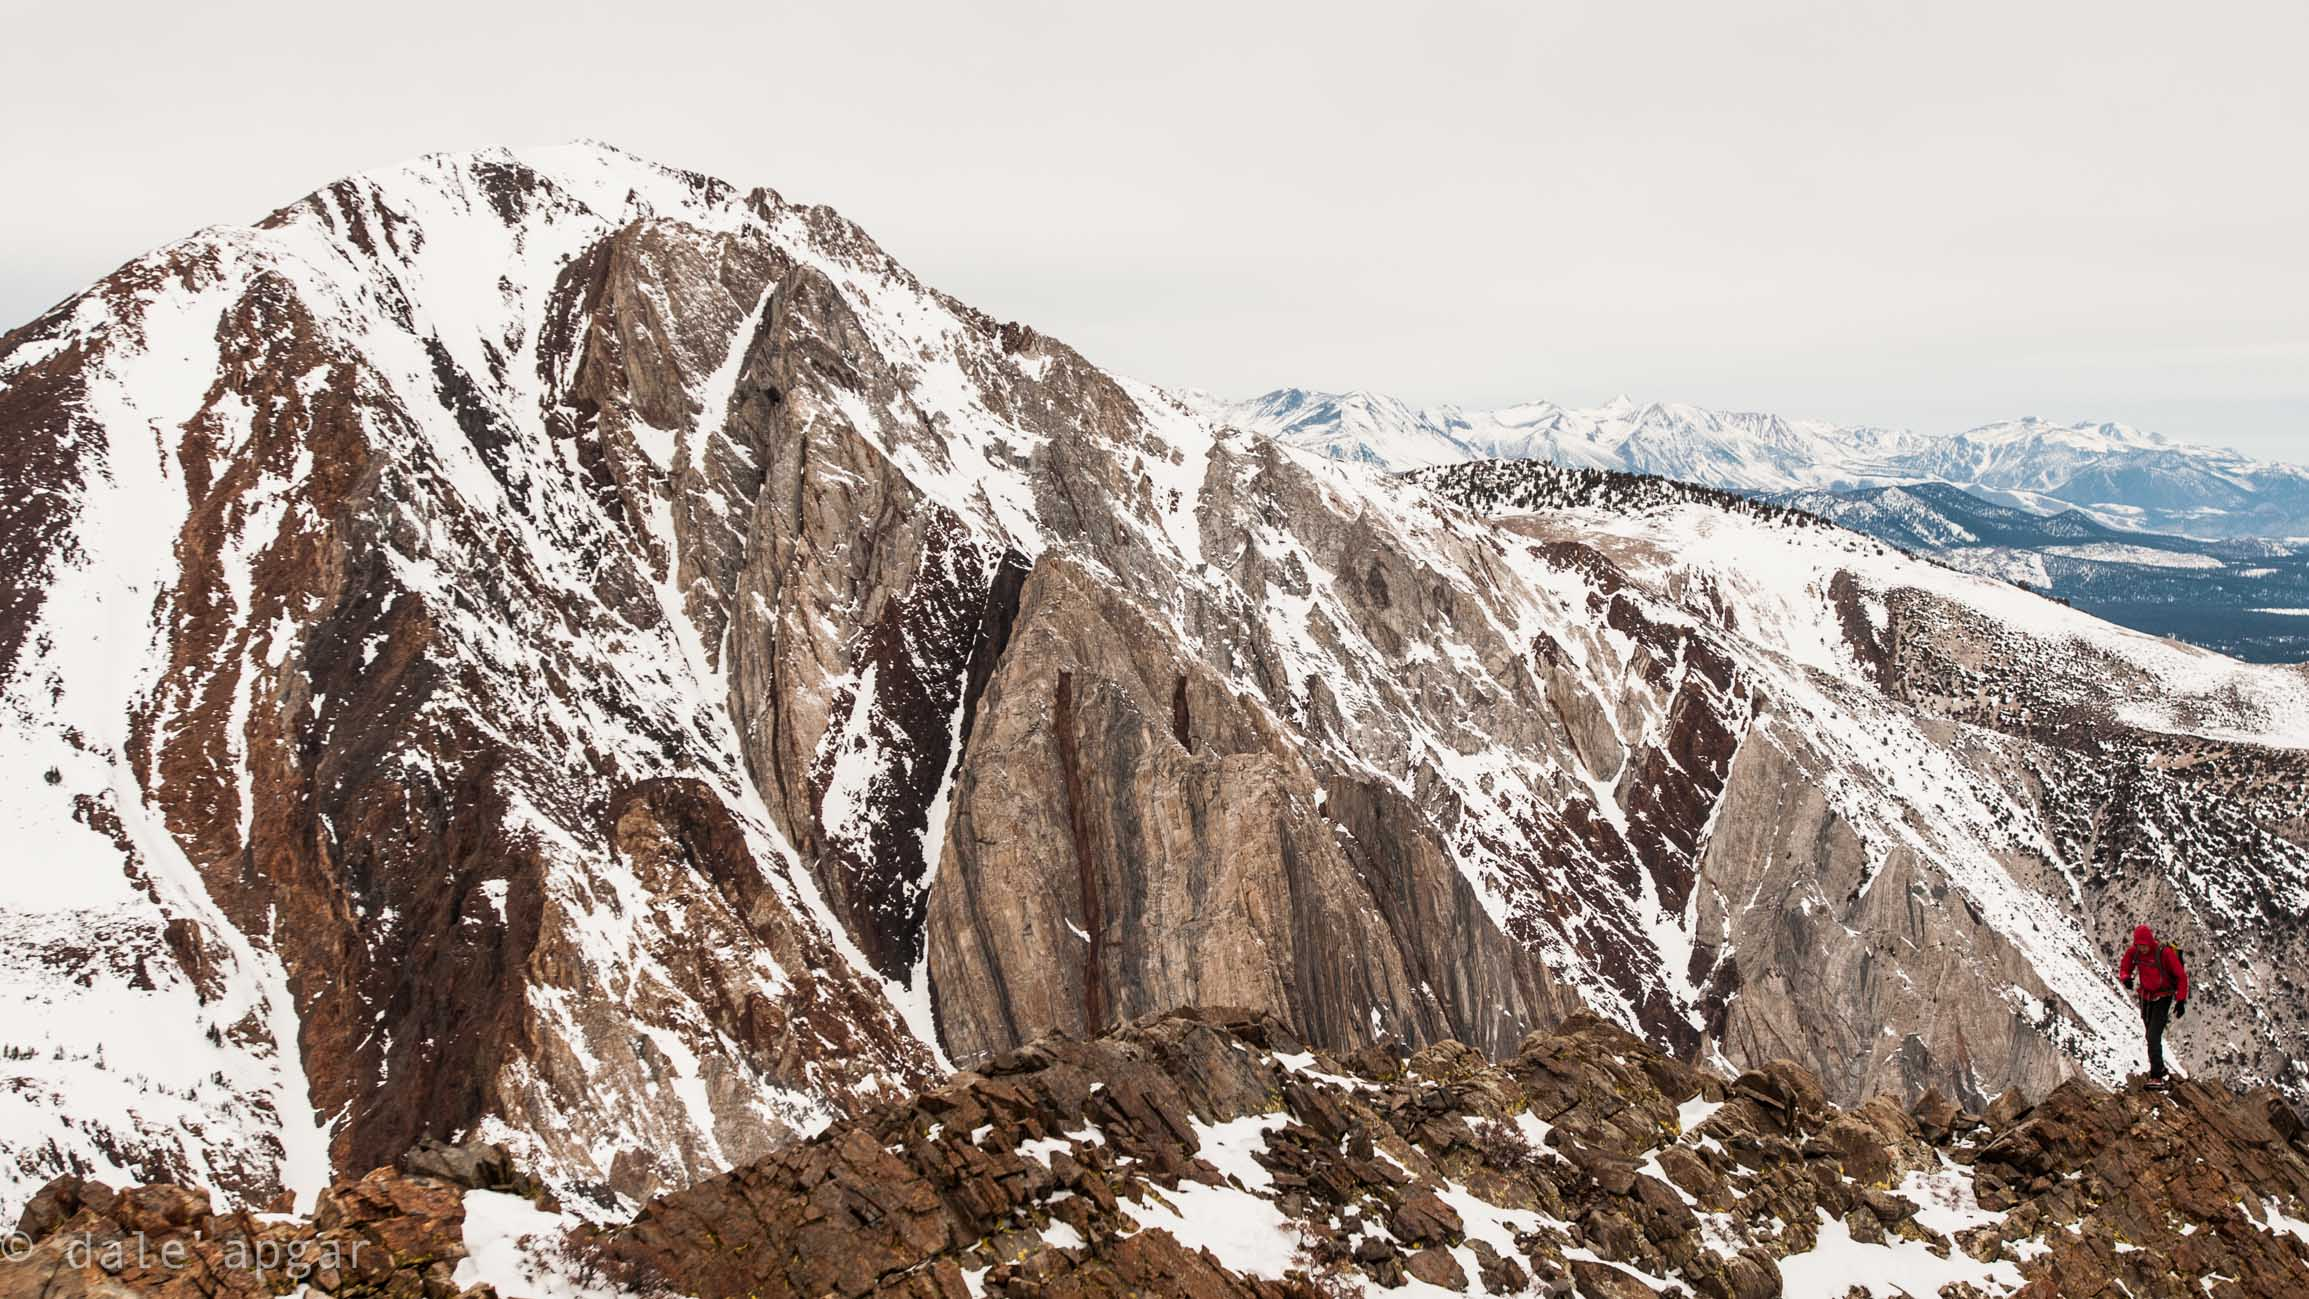 Kicking off the start of Williamson's west ridge